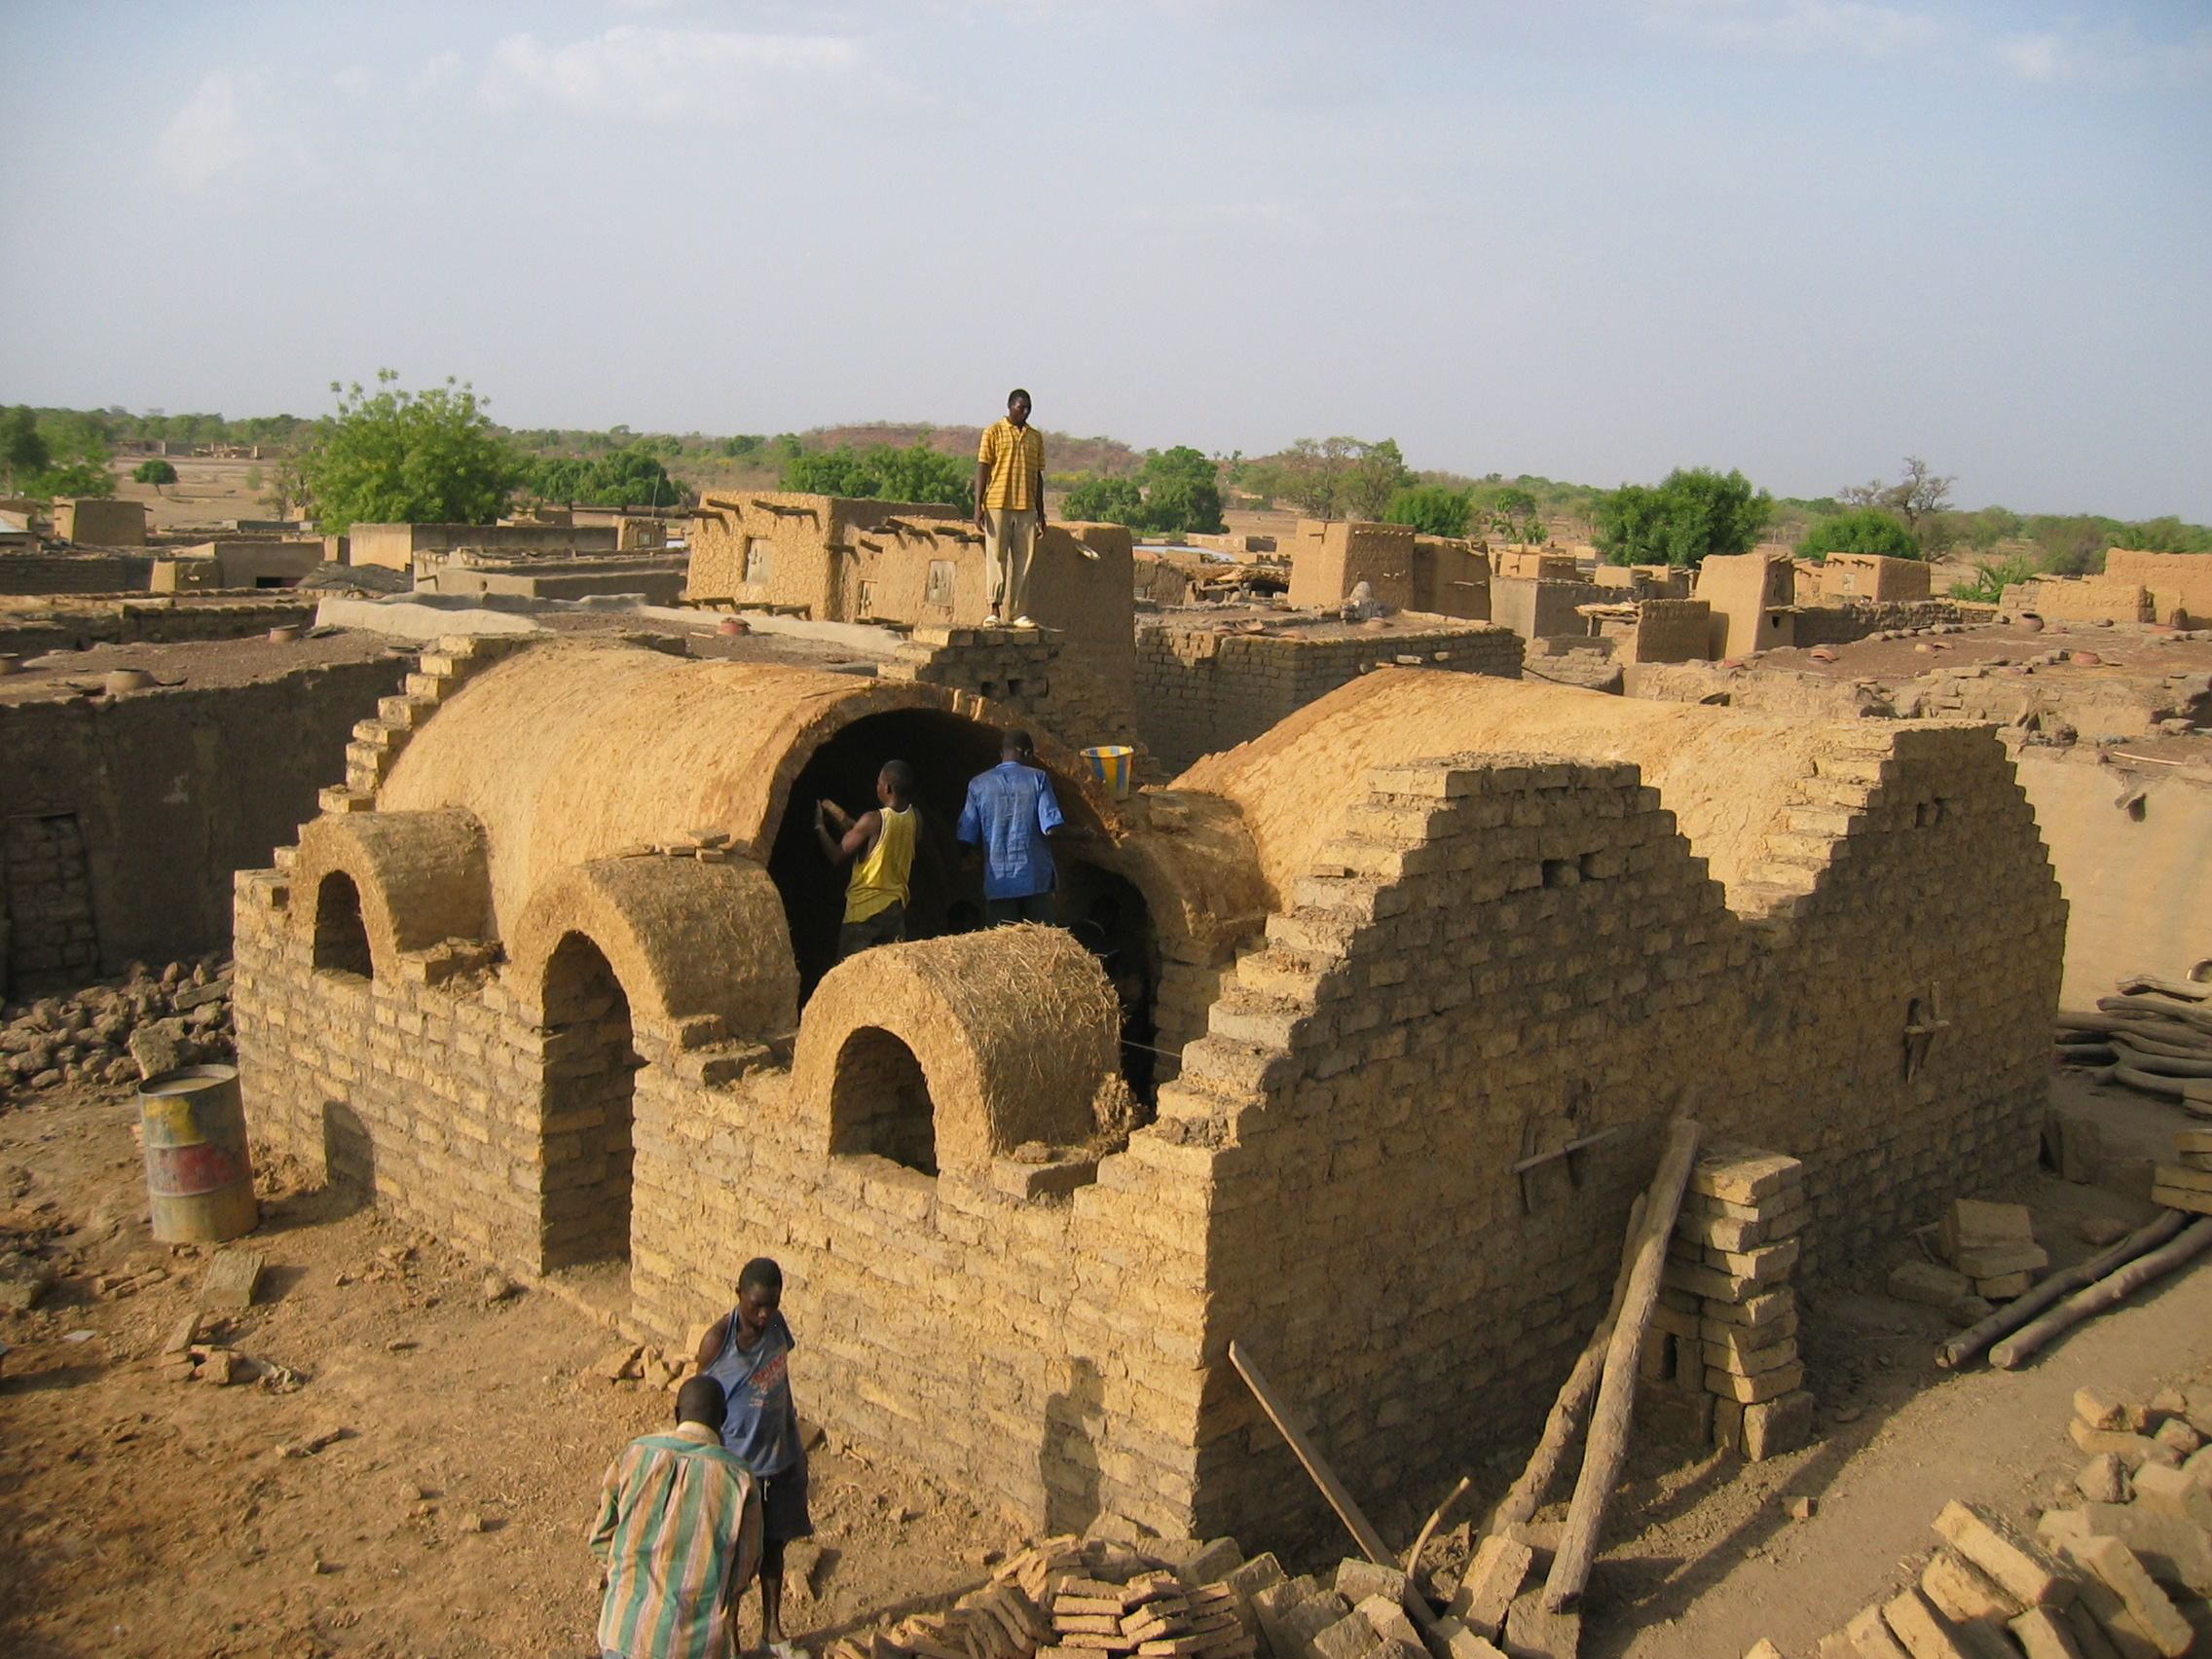 Result_-_Earth_Roofs_in_the_Sahel_Program.jpg